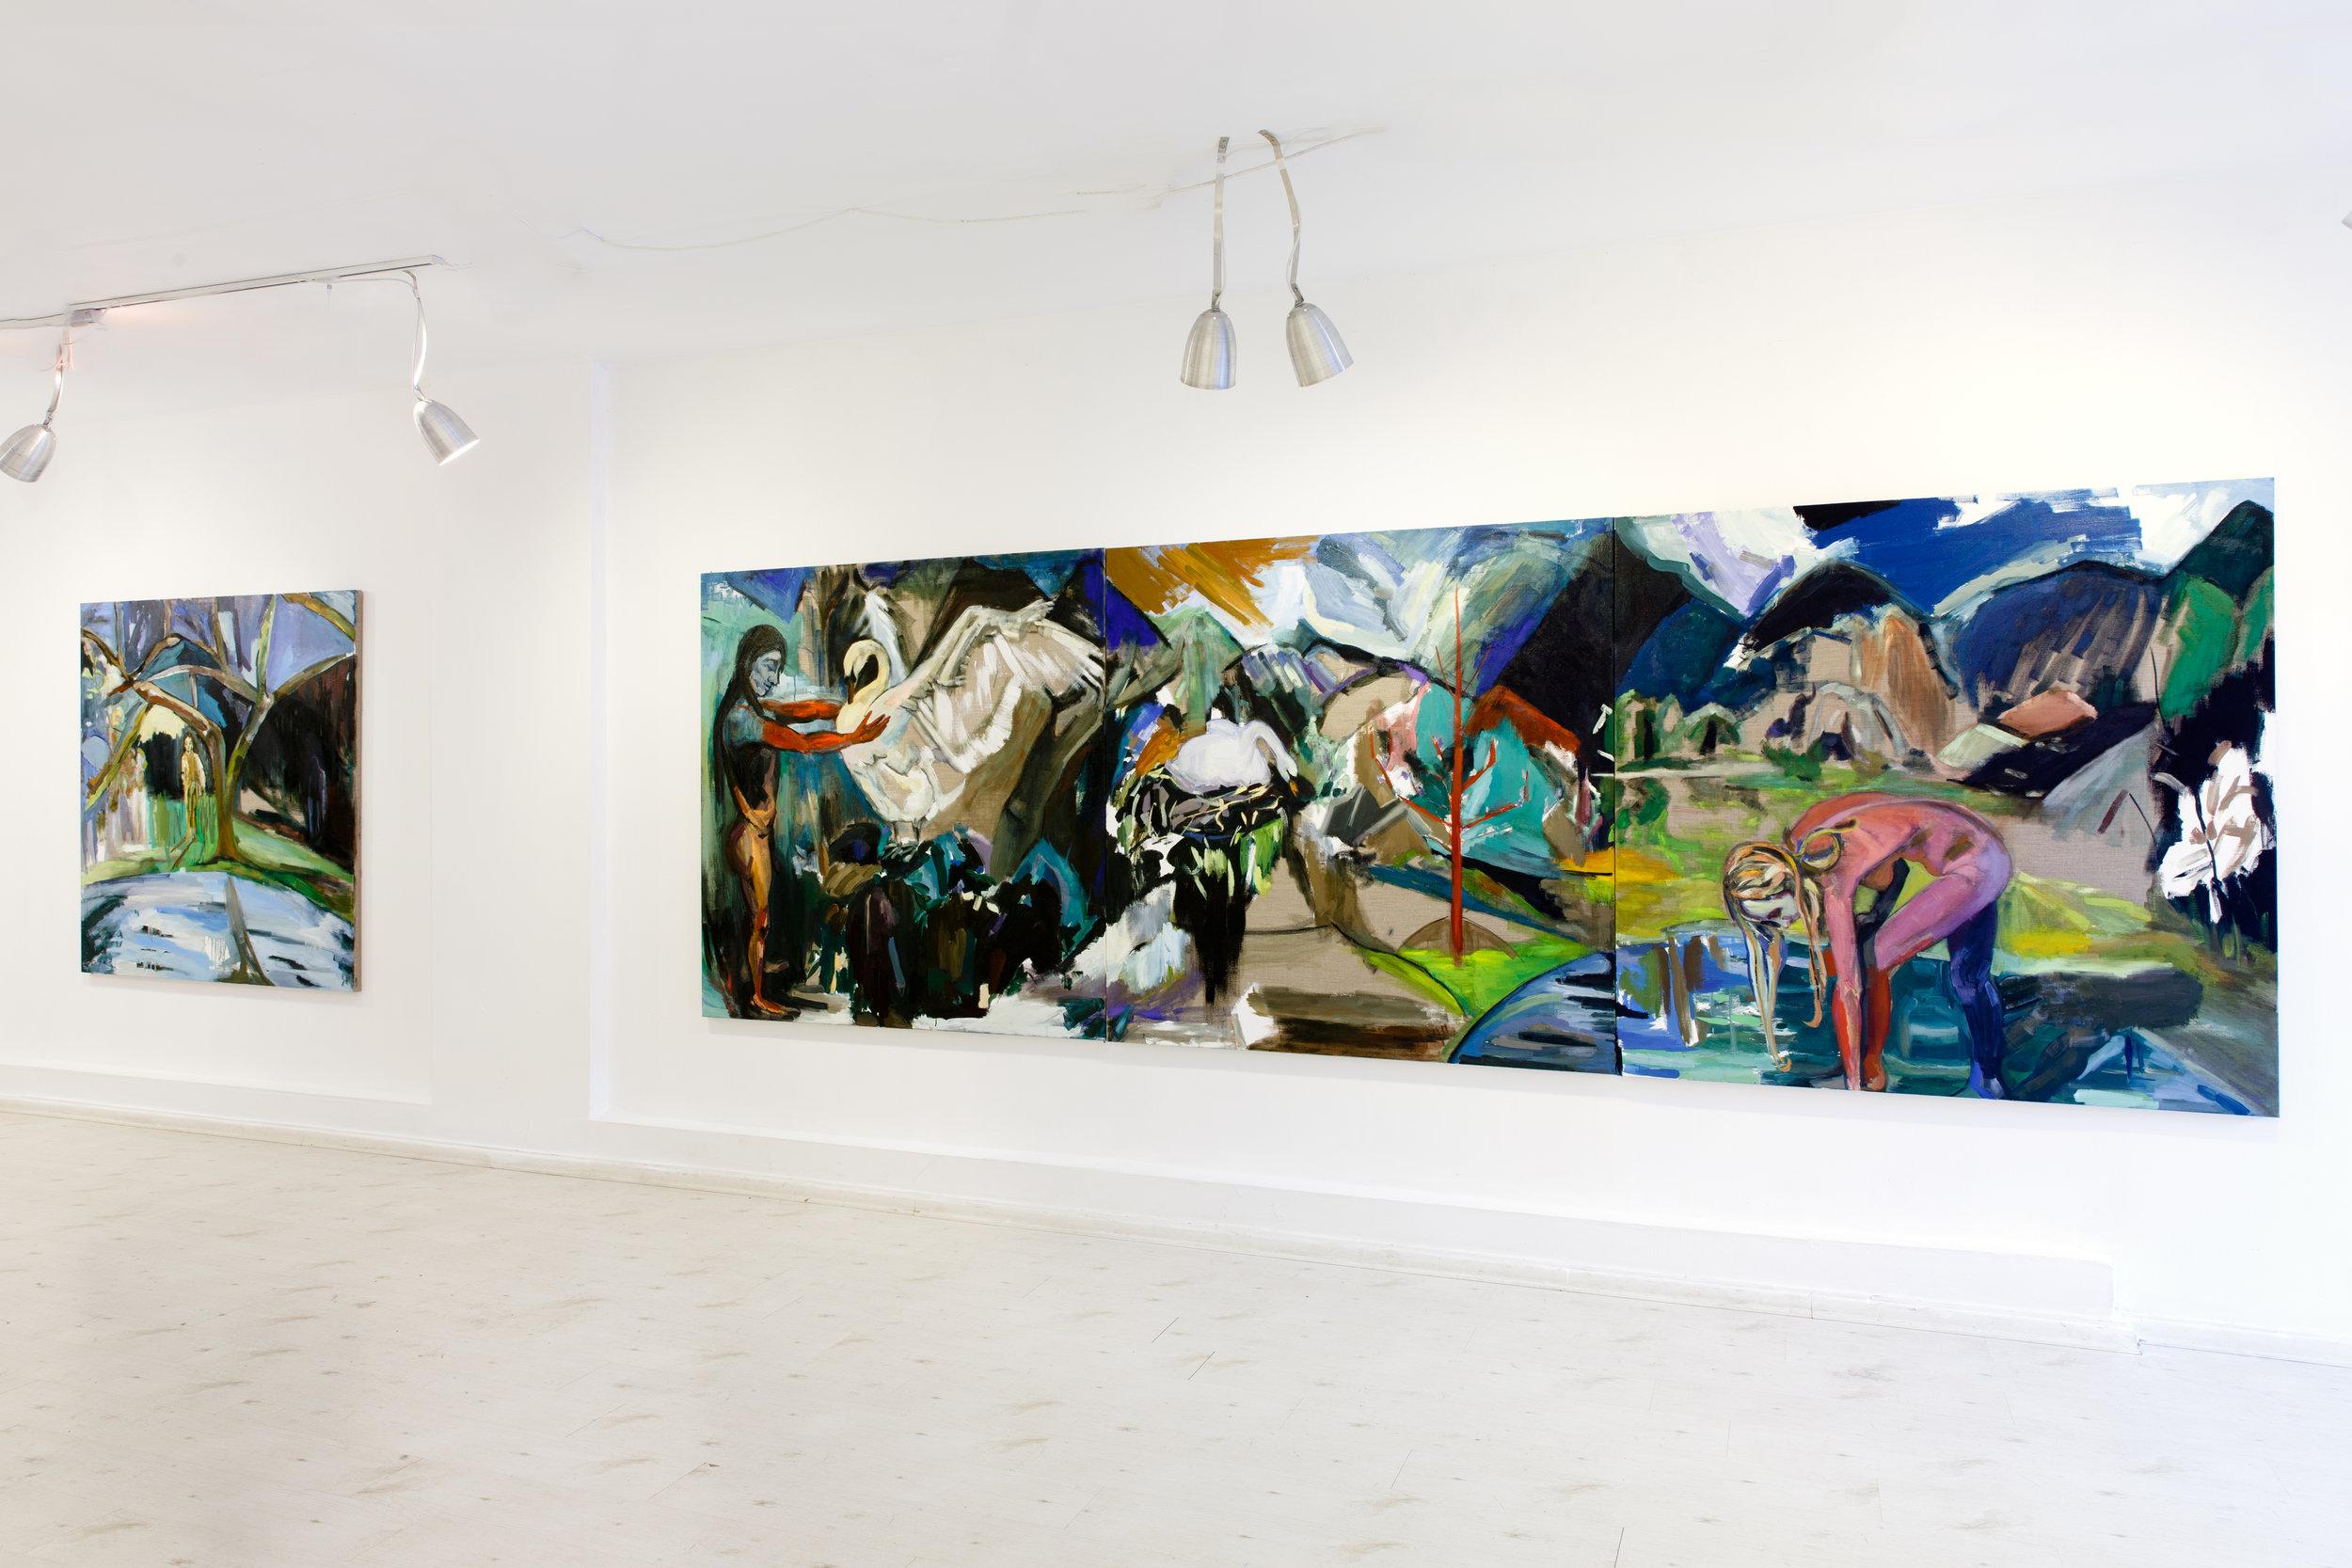 Hippodrome, Hanina gallery, Tel Aviv, 2017